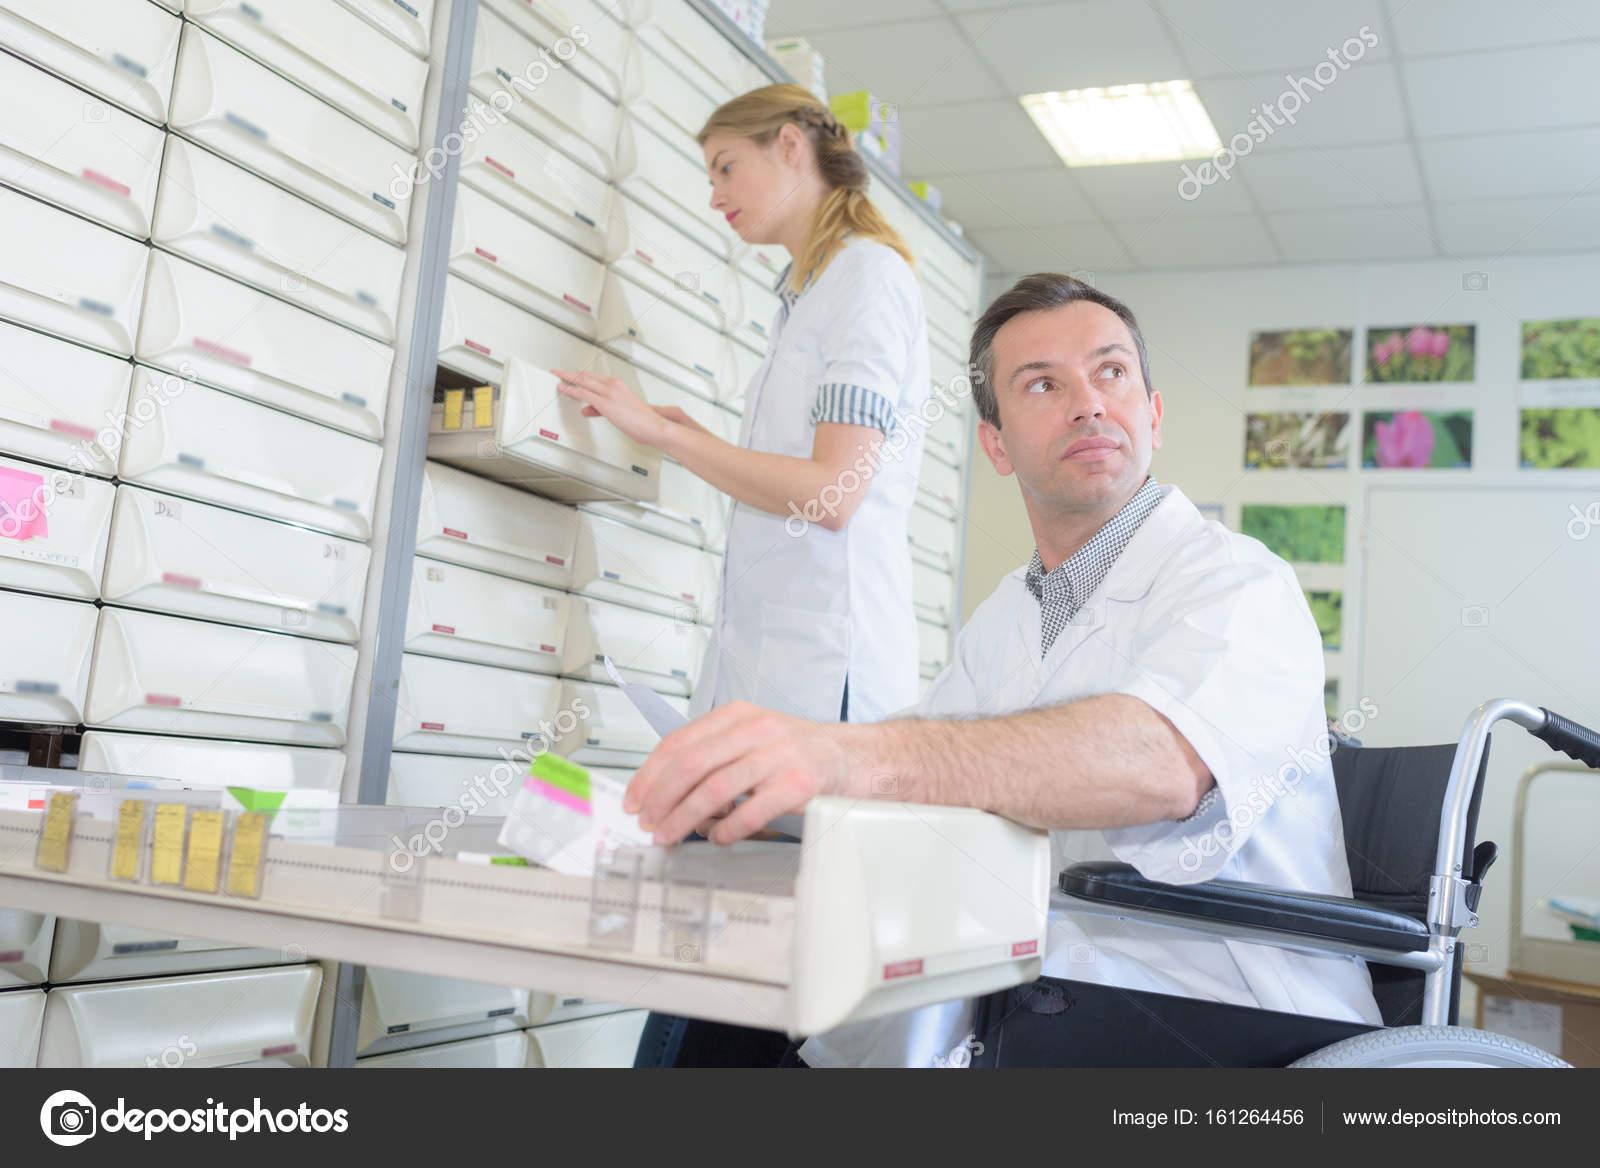 Apotheker stehen und Apotheke Techniker im Rollstuhl — Stockfoto ...